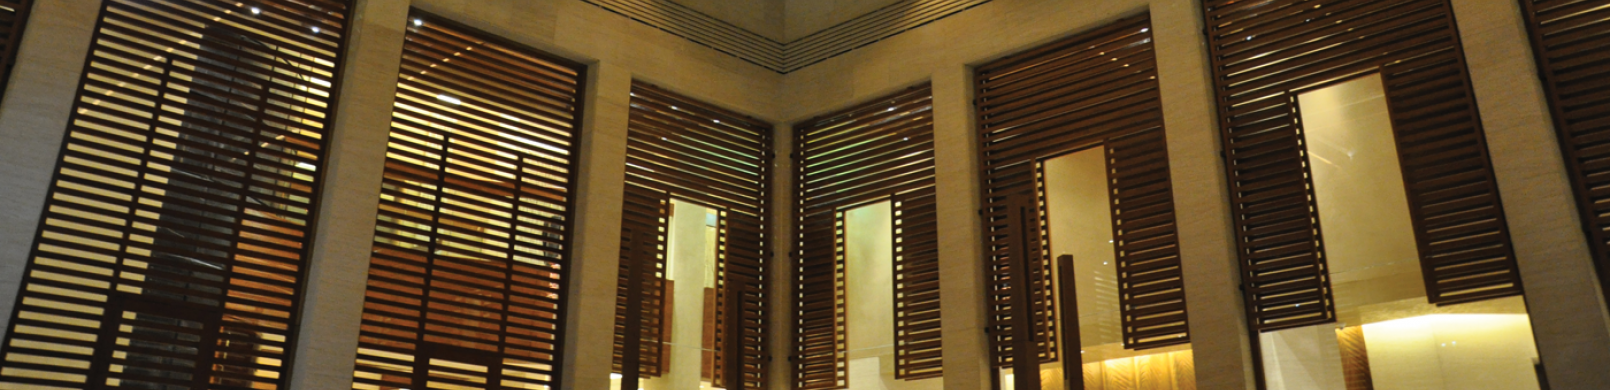 Art Line Qatar : Private villas artline